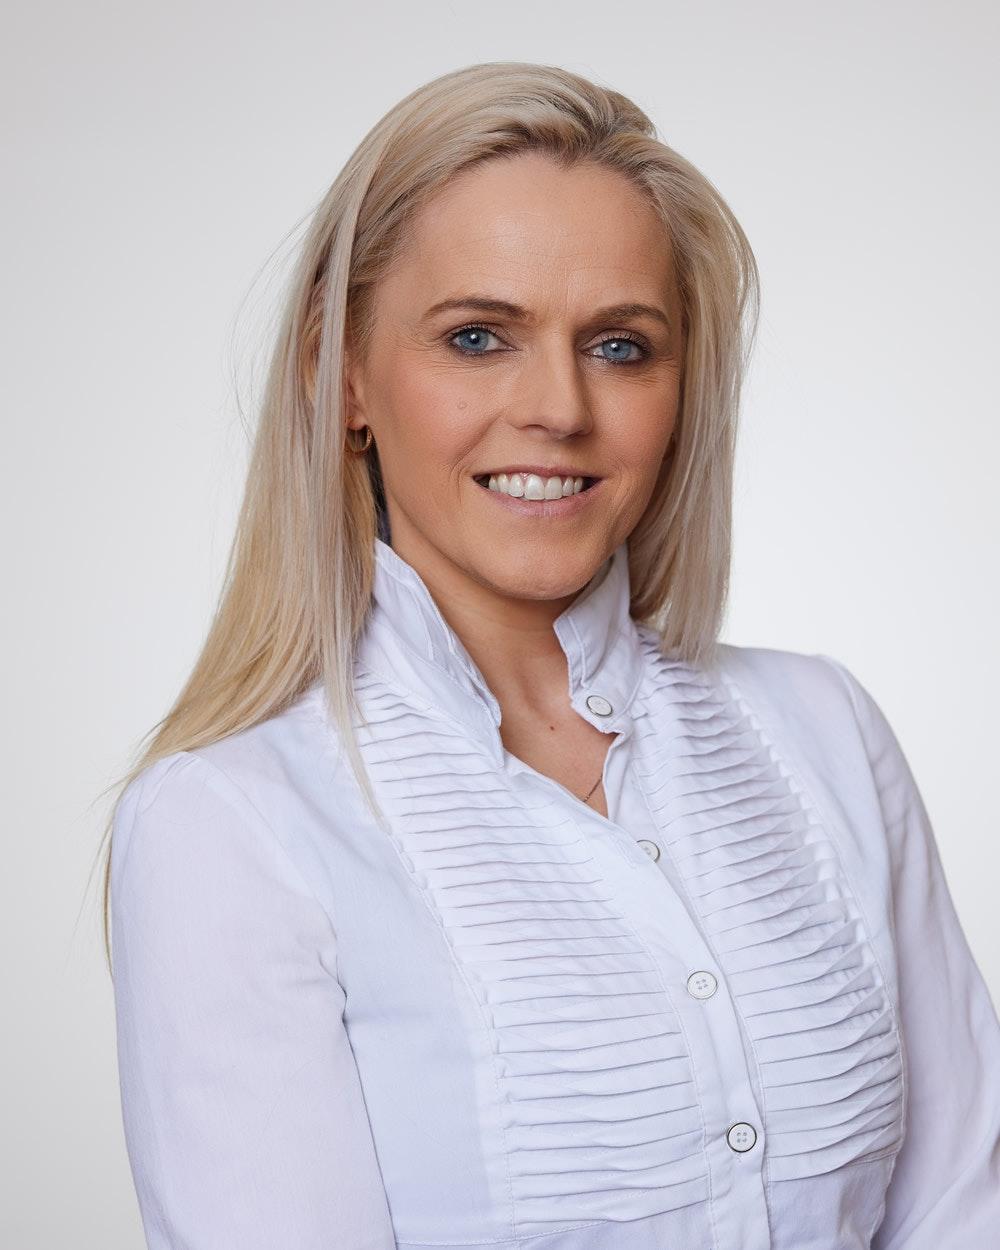 Þóra Eggertsdóttir